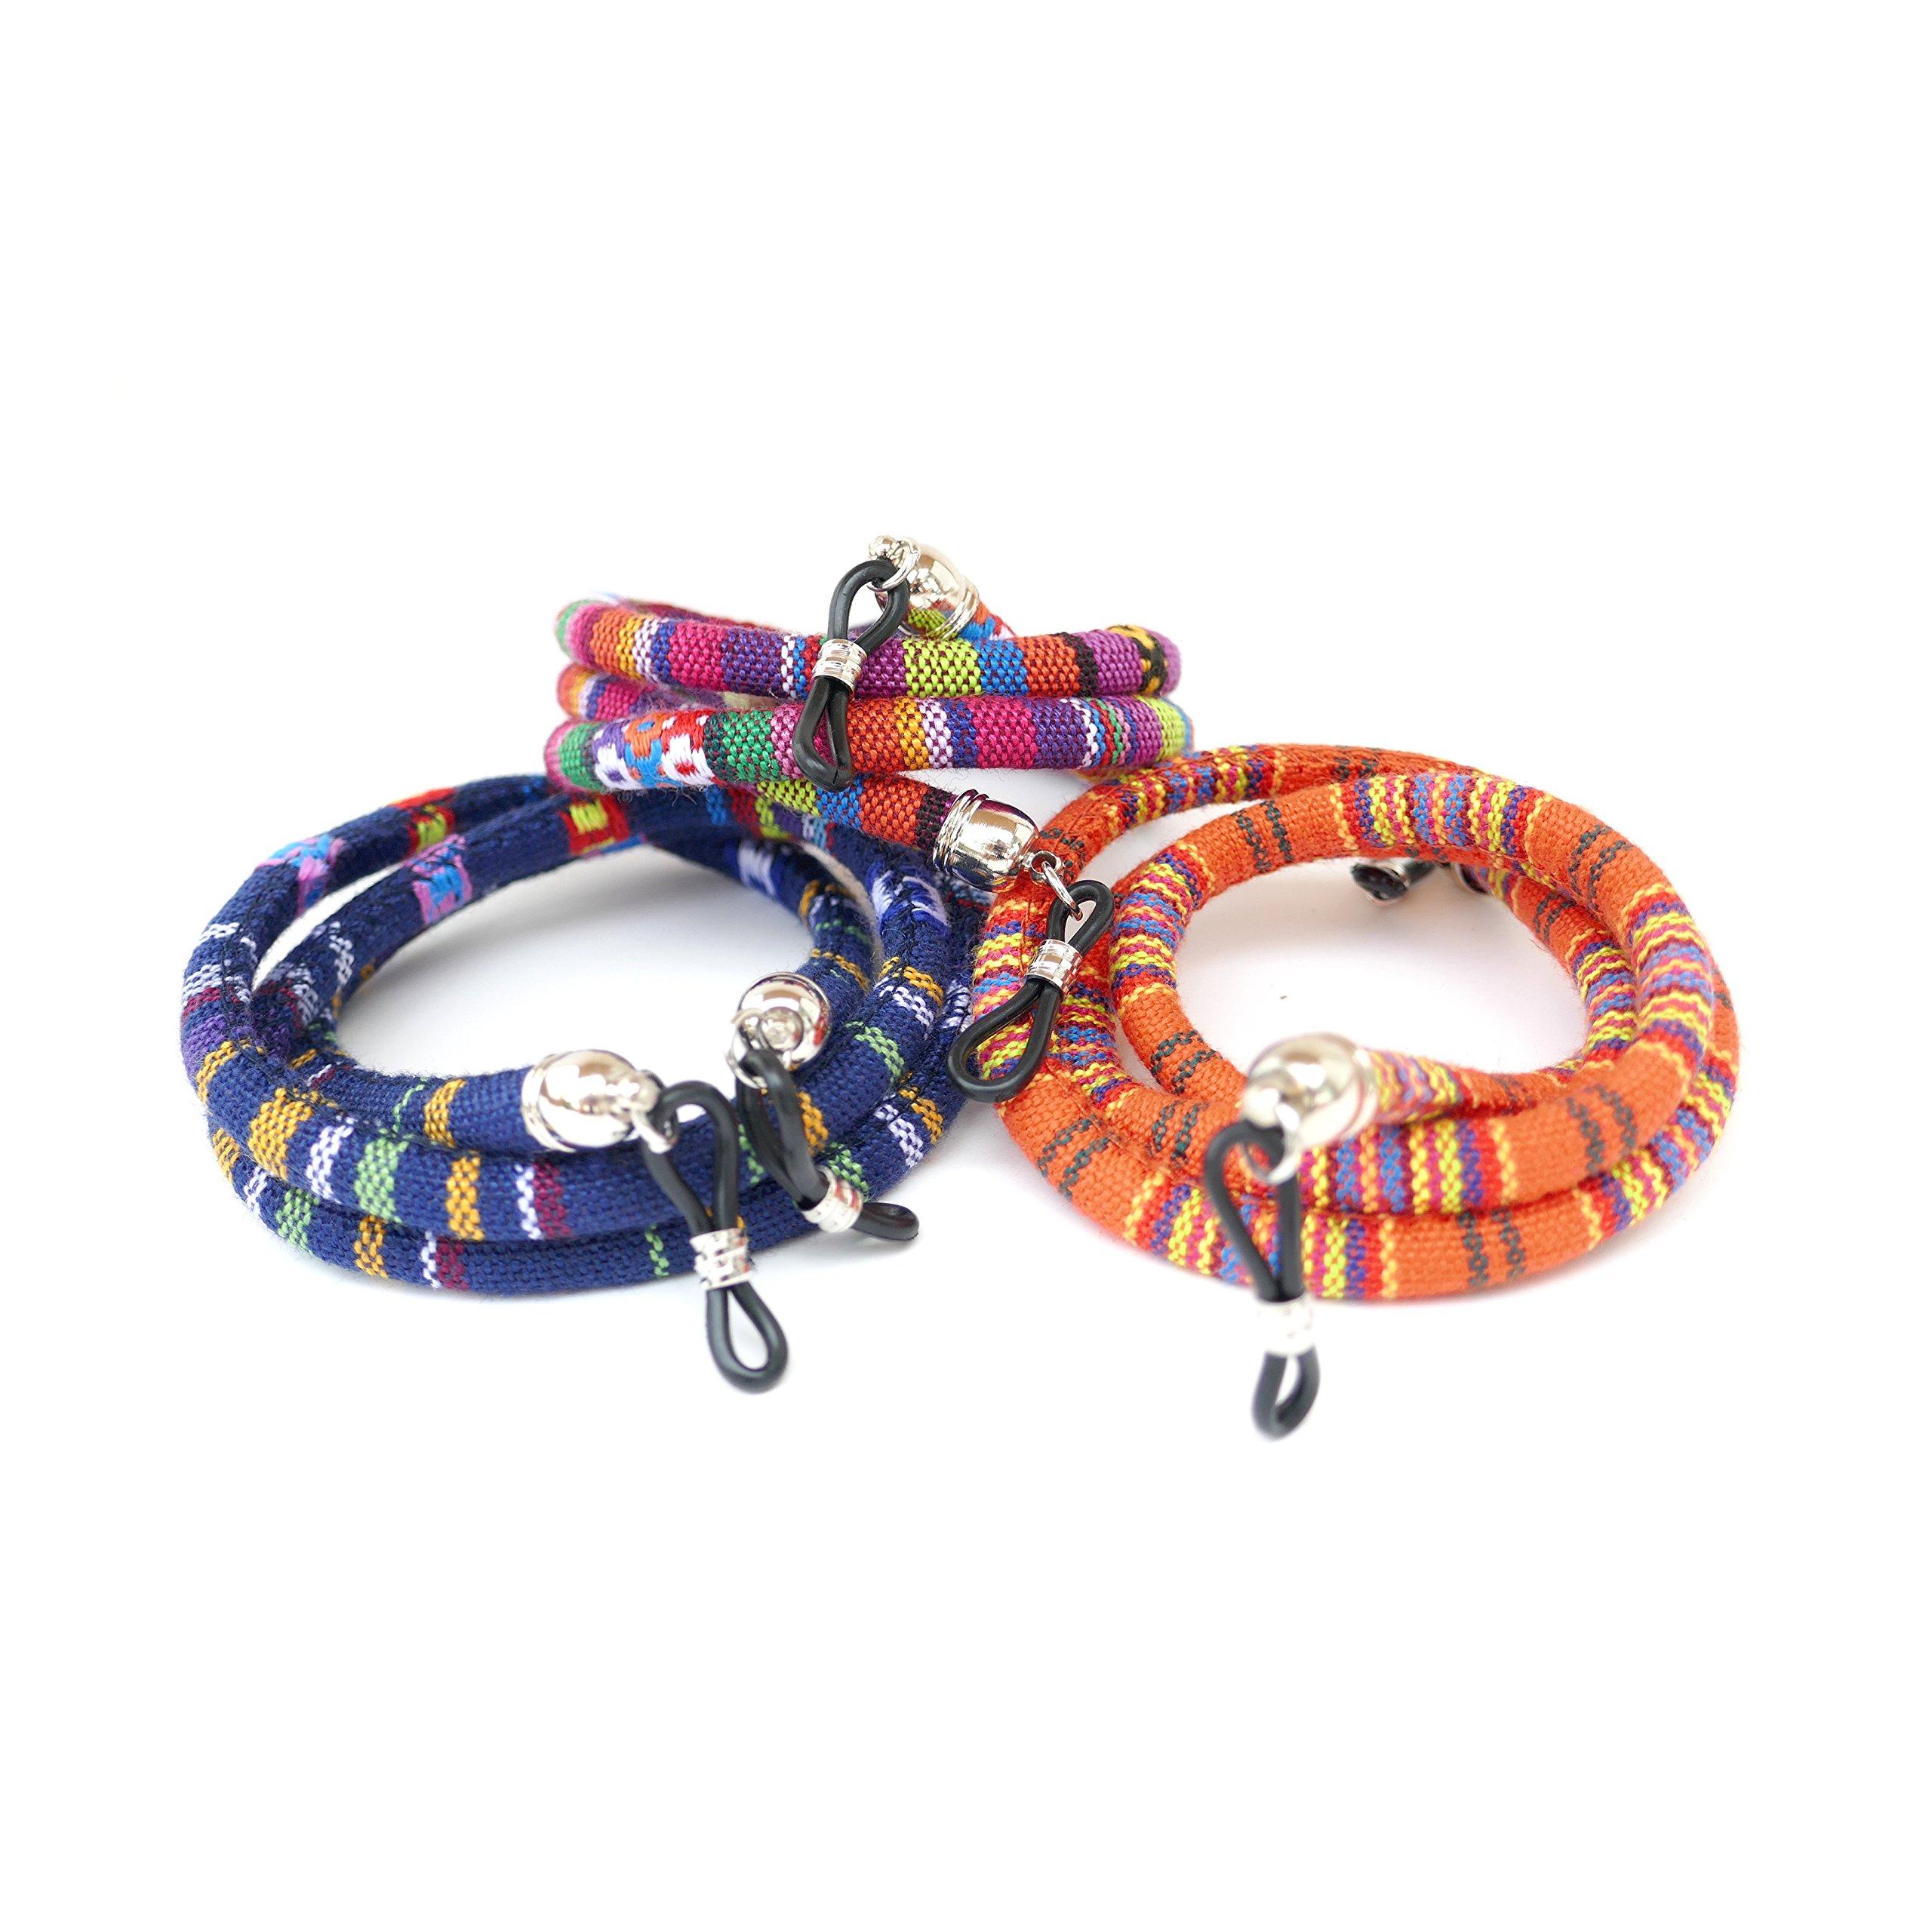 Tarifa Fashion Sunglasses Round Retainer Strap - Round Bundle